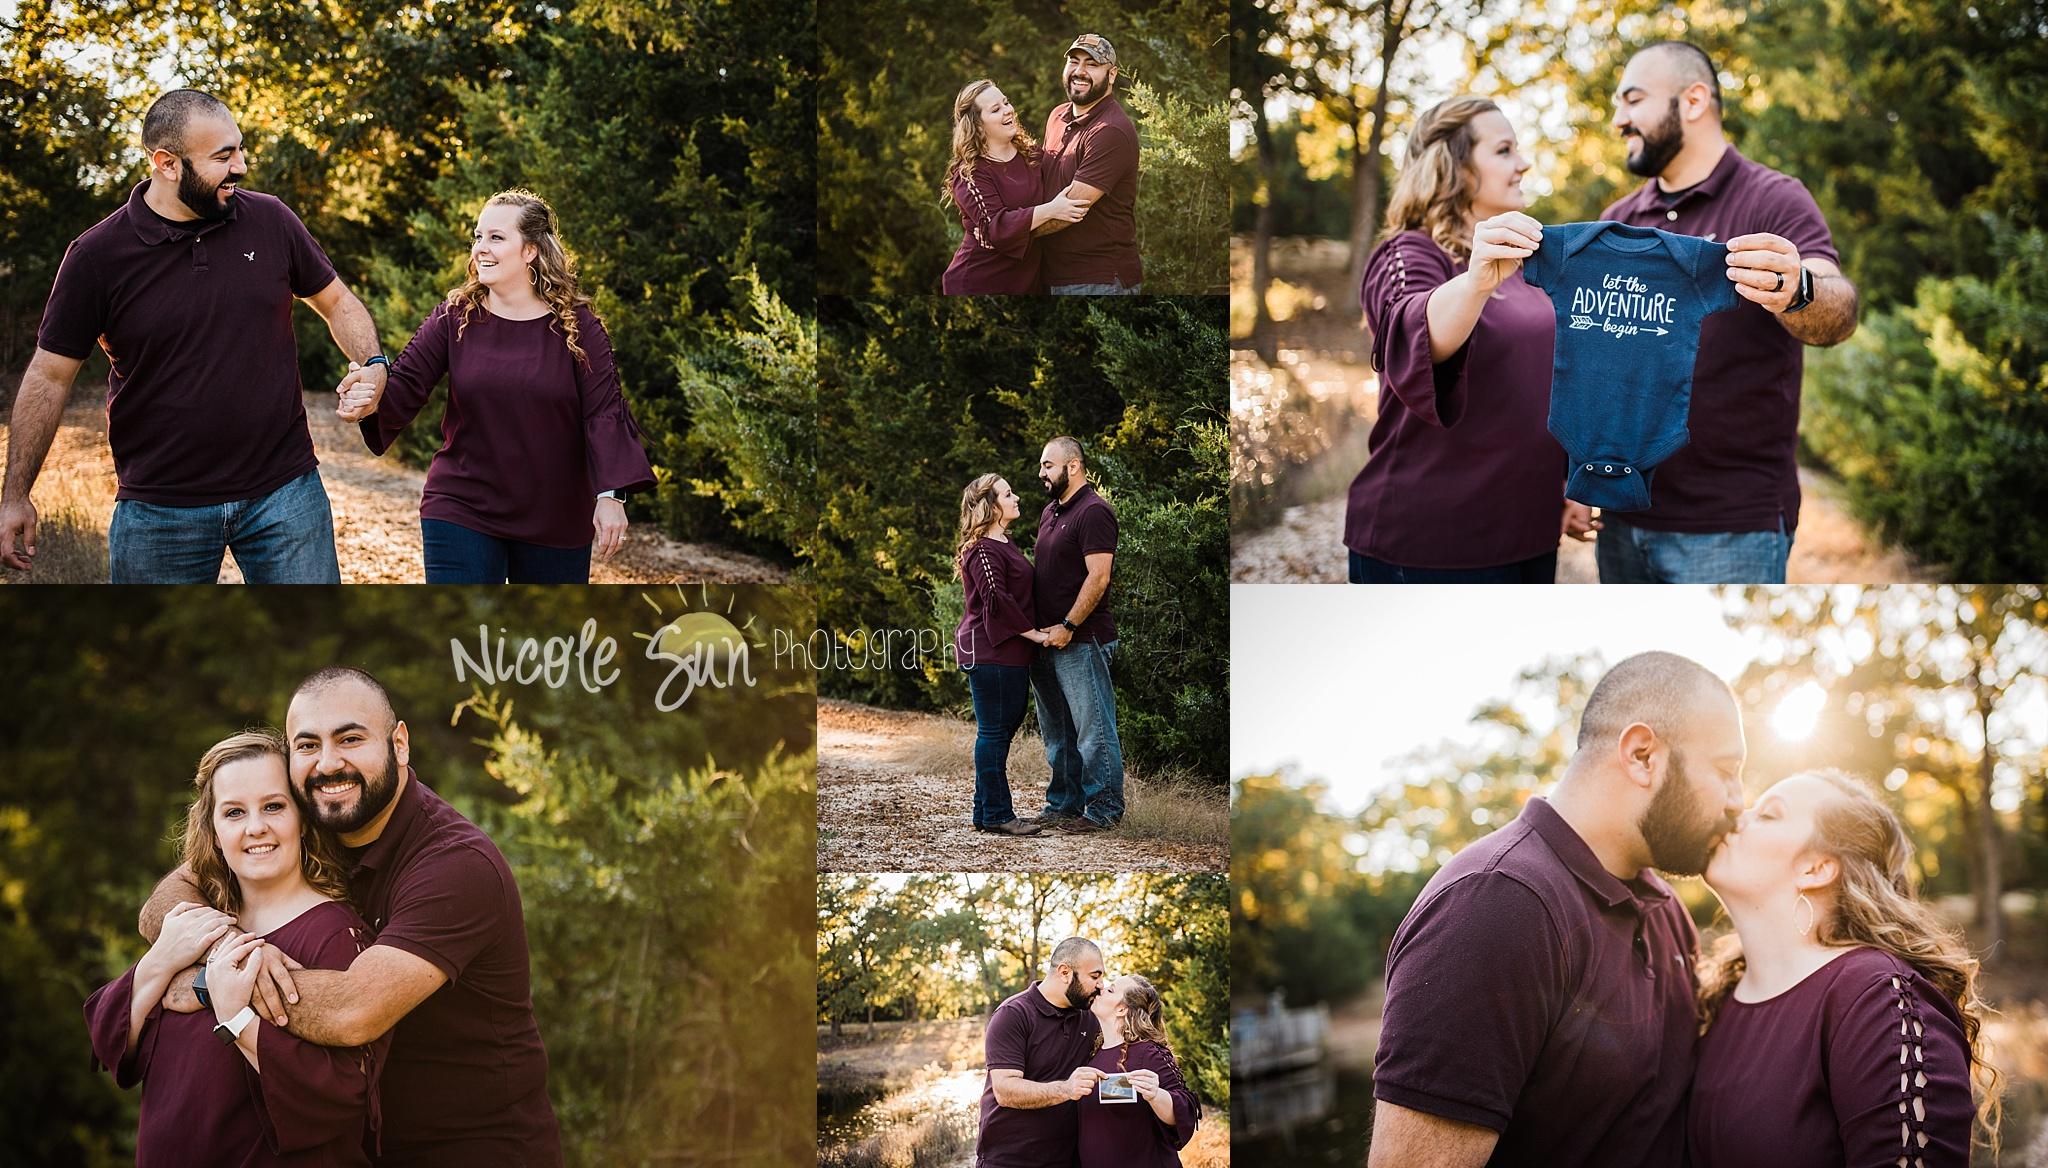 Pregnancy Announcement Session - Aubrey, TX